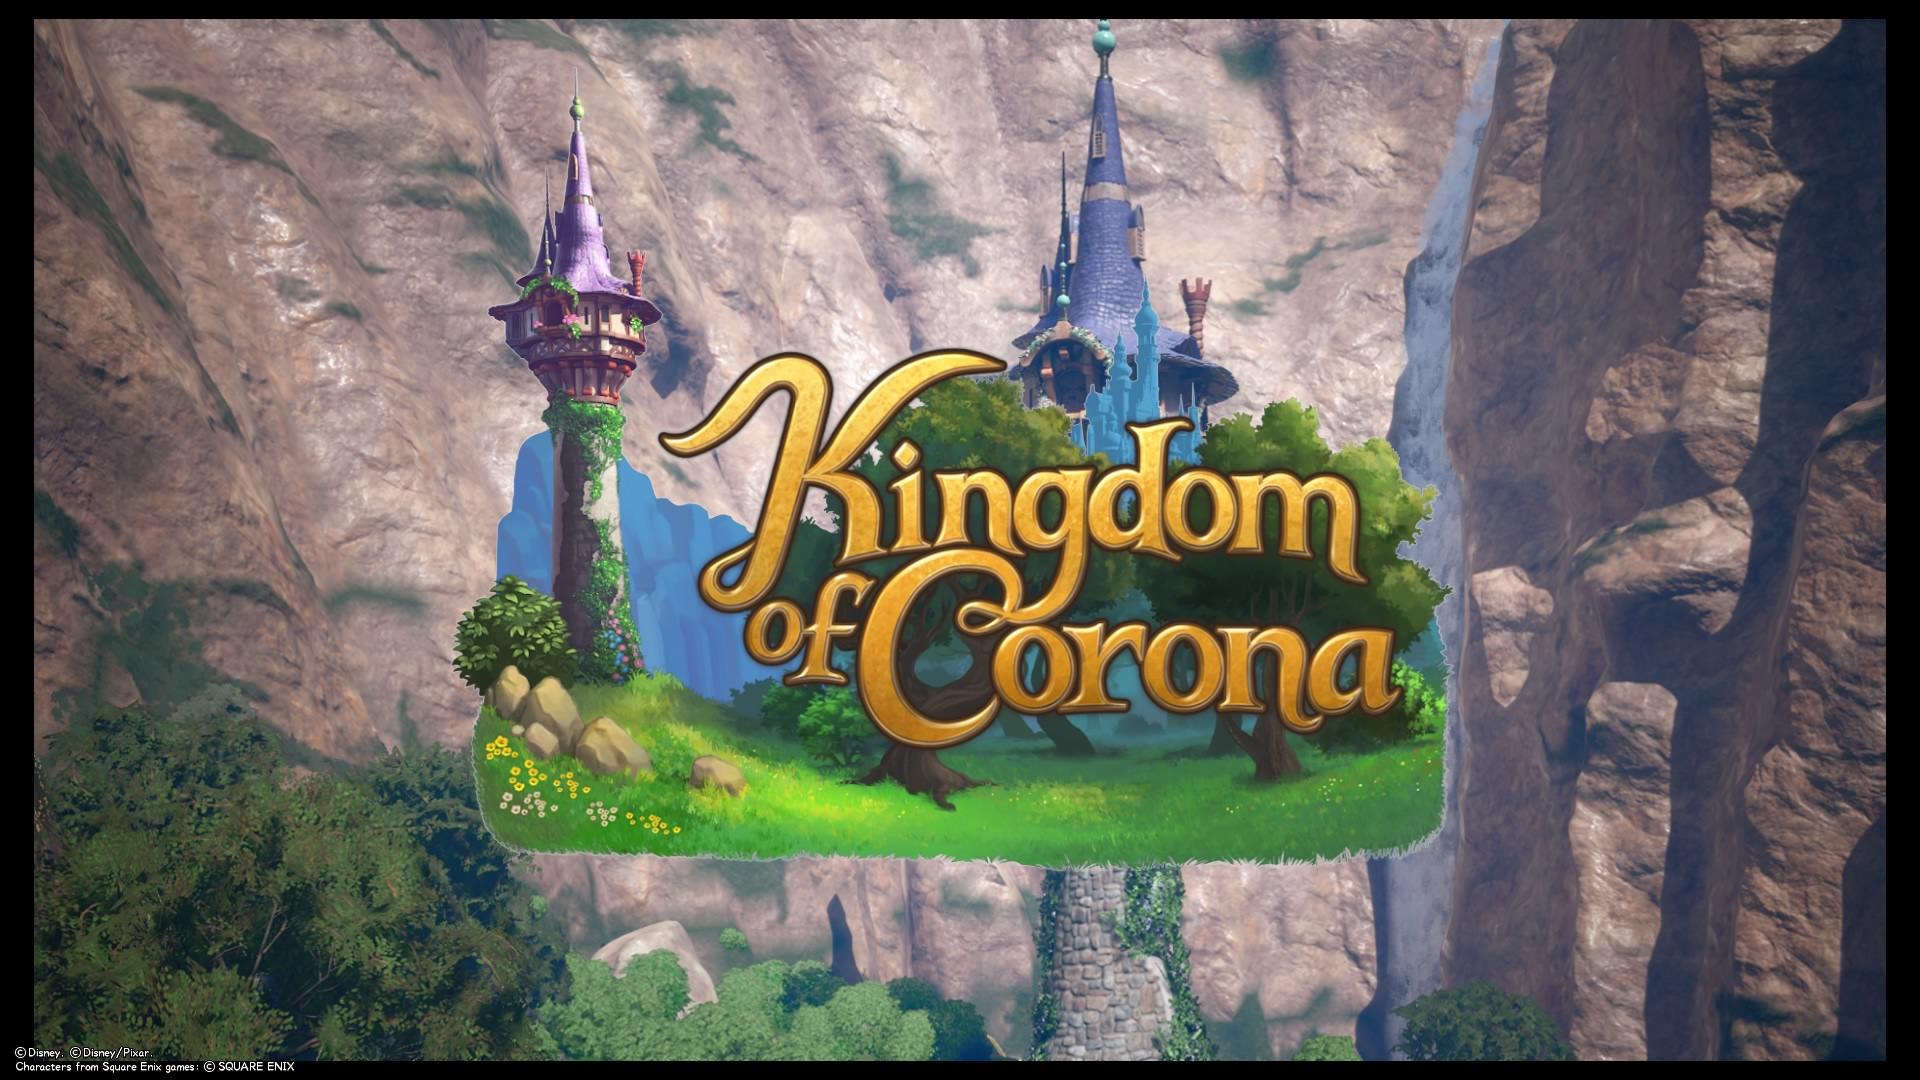 Kingdom Hearts 3: Kingdom Of Corona (Walkthrough And Guide)